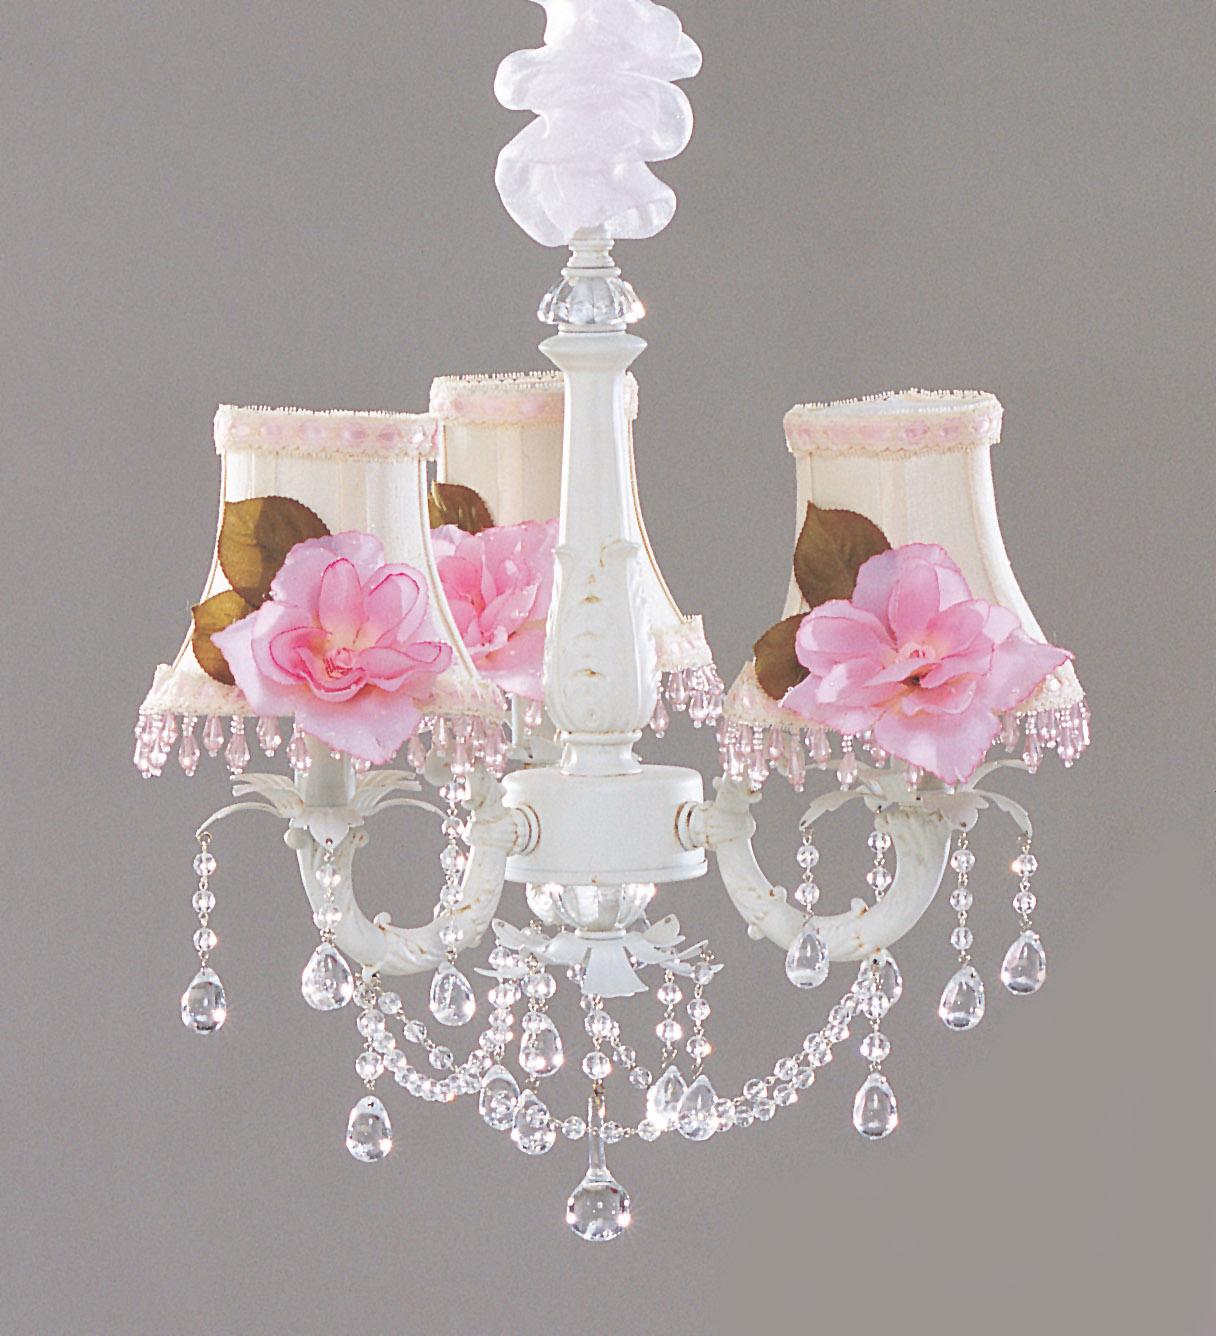 I lite 4 u shabby chic style mini chandeliers lighting allieg 328276 bytes arubaitofo Images